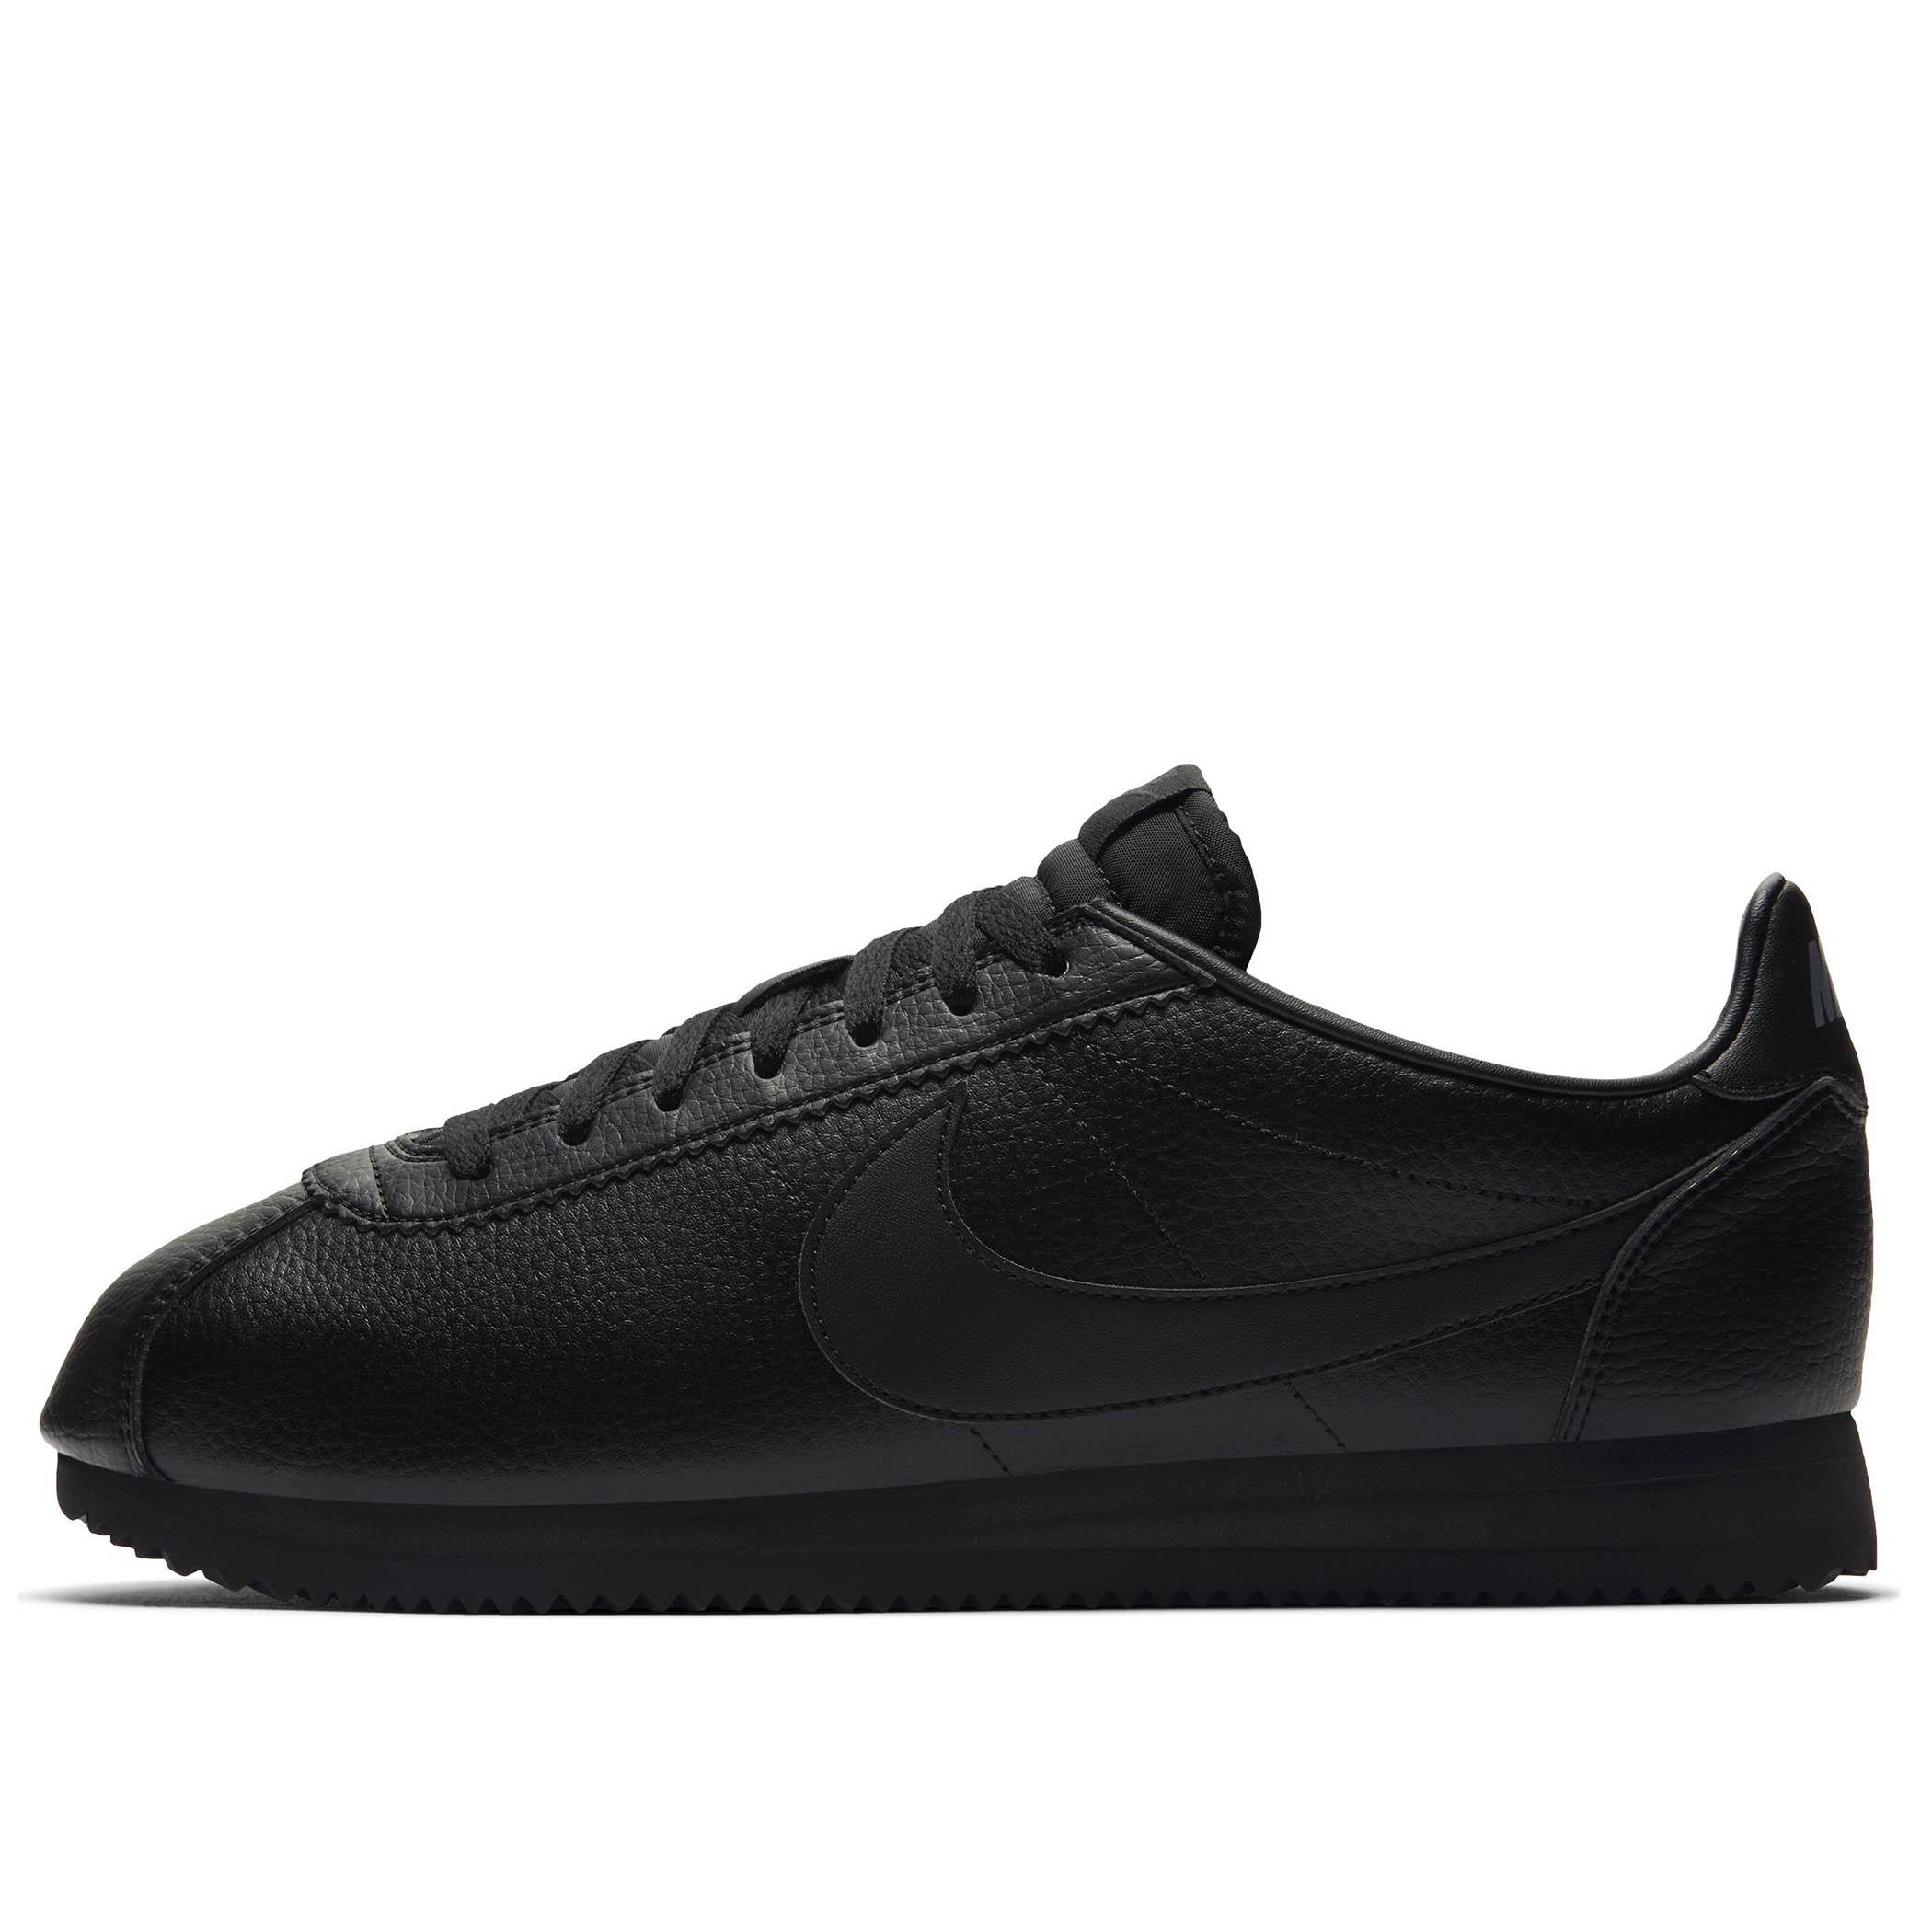 80391656 Мужские кроссовки Nike Classic Cortez Leather Black/Black-Anthracite - фото  1